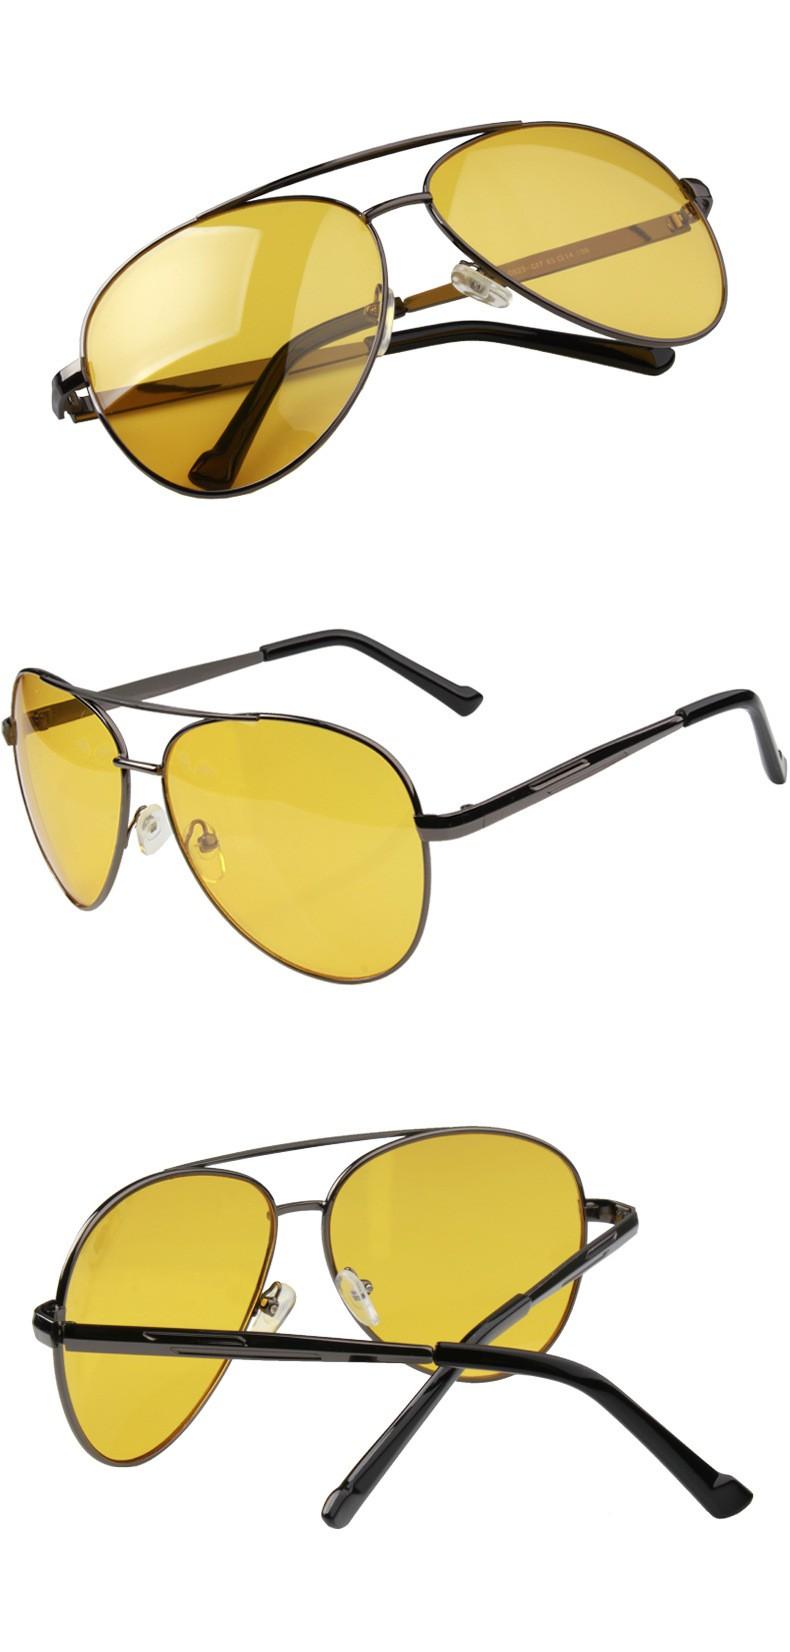 Yellow Aviator Sunglasses Multiple Angles